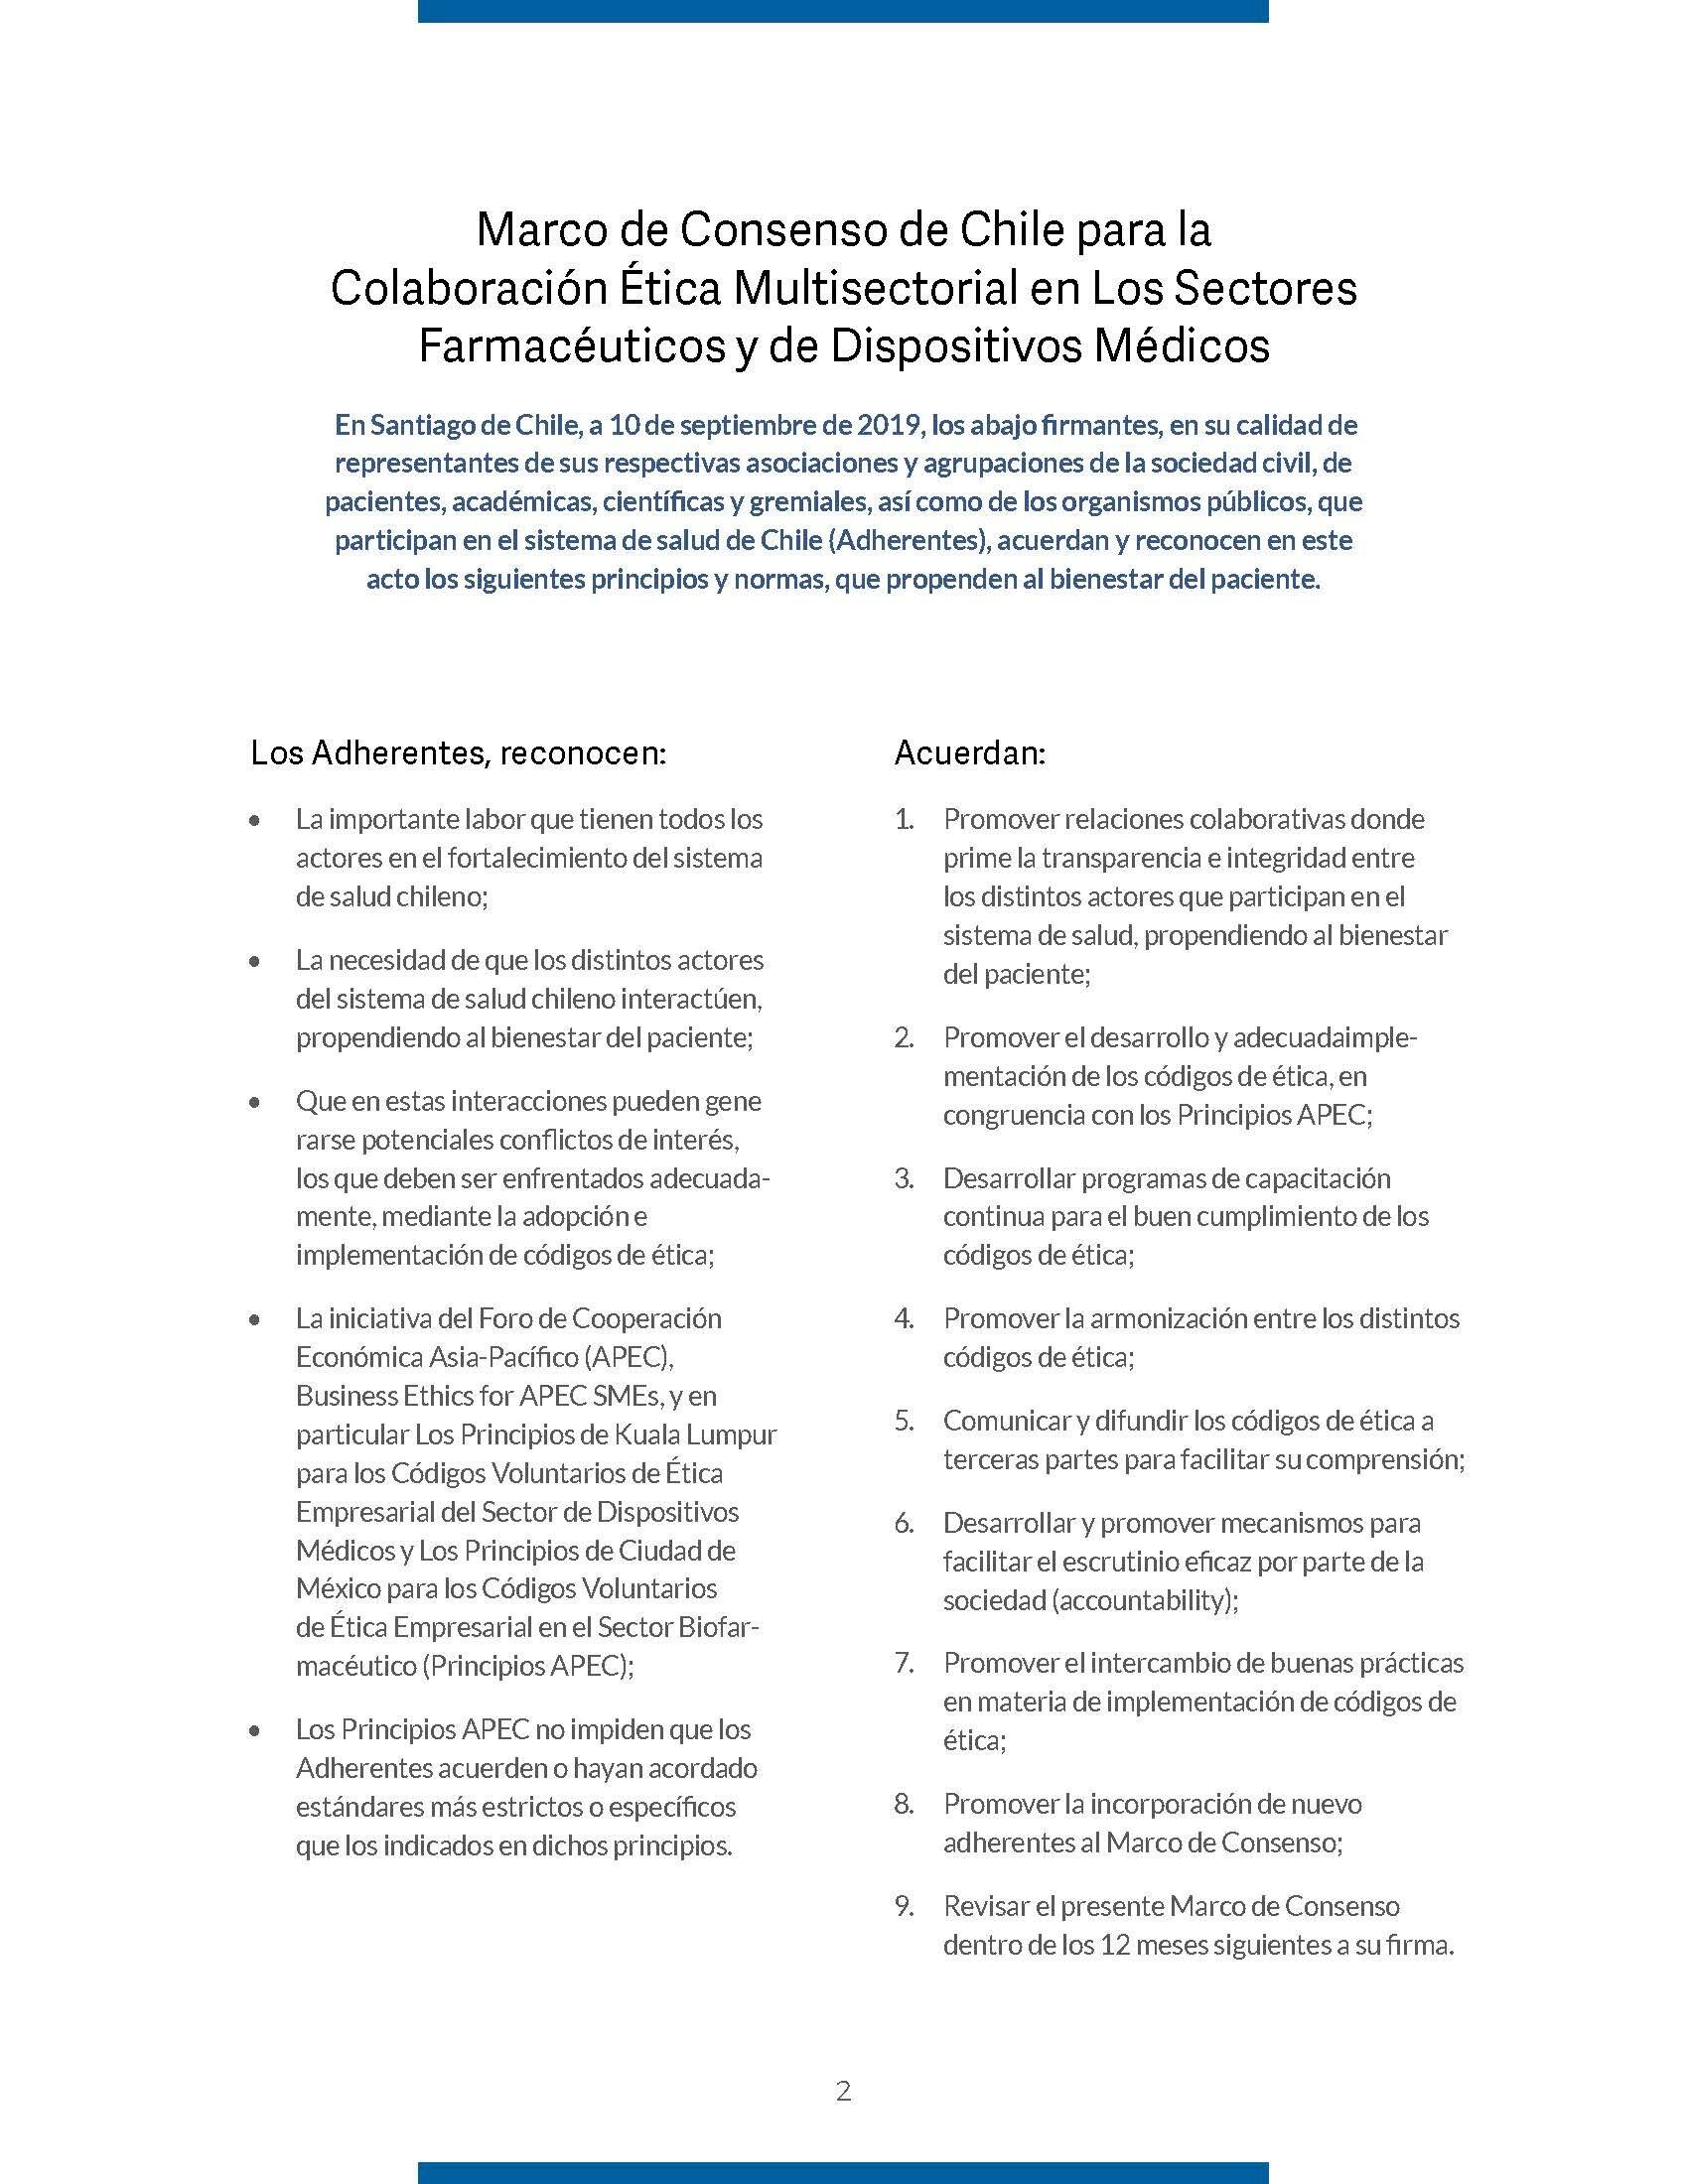 Chile_ConsensusFramework_Final_Página_2.jpg